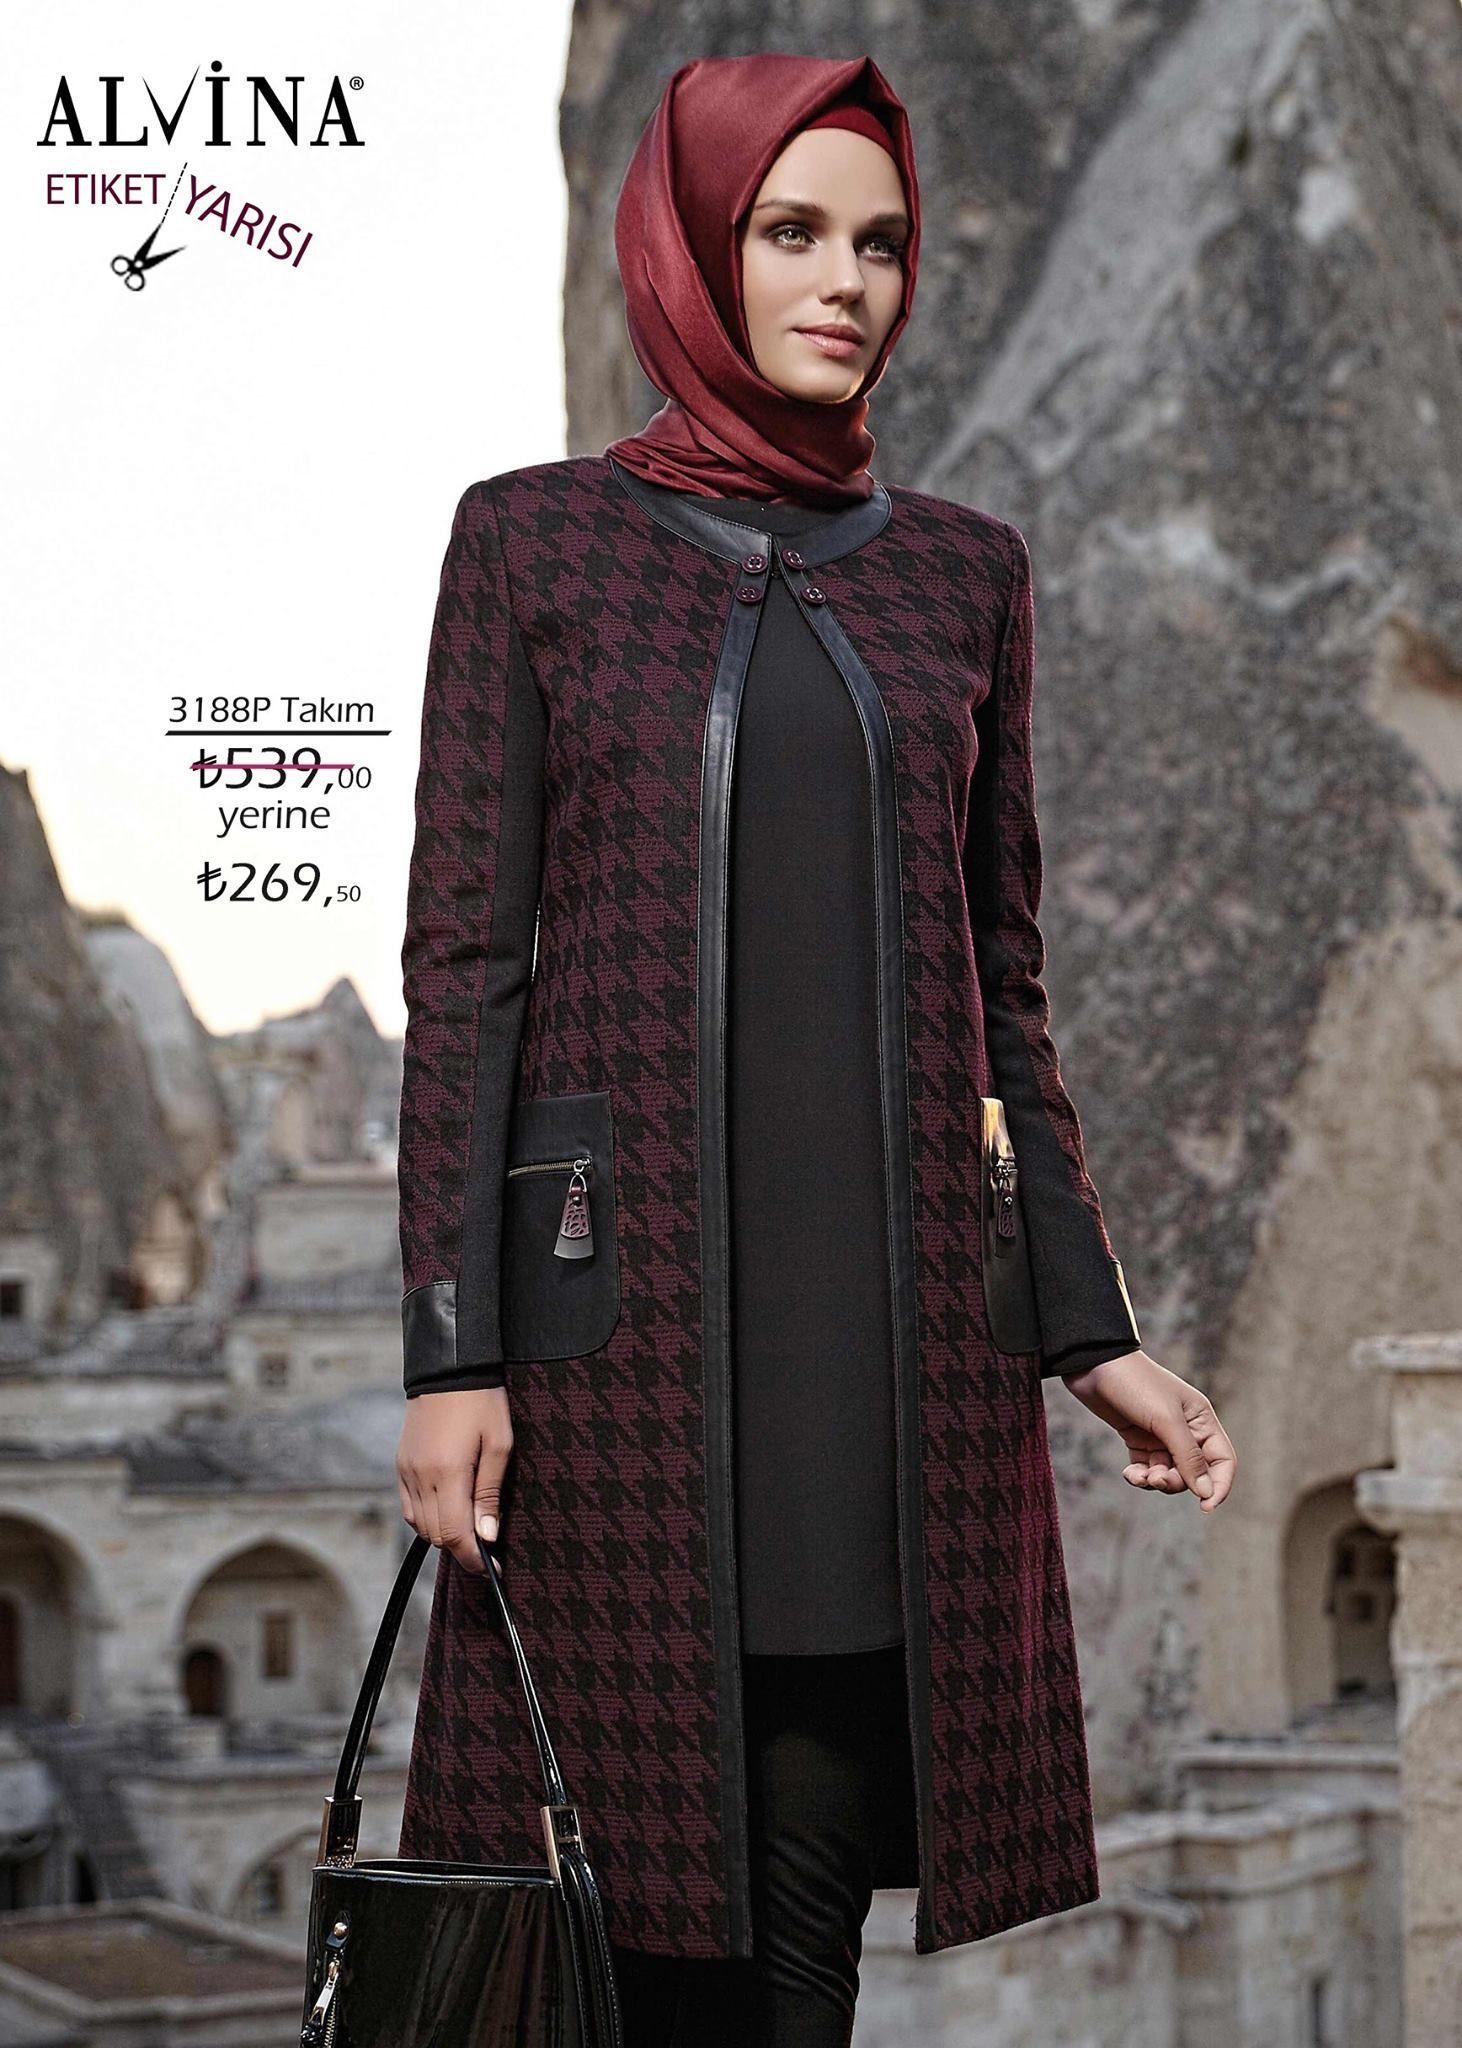 Pin By Zizo On Alvina 16 Sonbahar Kis Cappadocia Kreasyonu Abaya Fashion Instagram Fashion Outfits Fall Fashion Outfits Casual